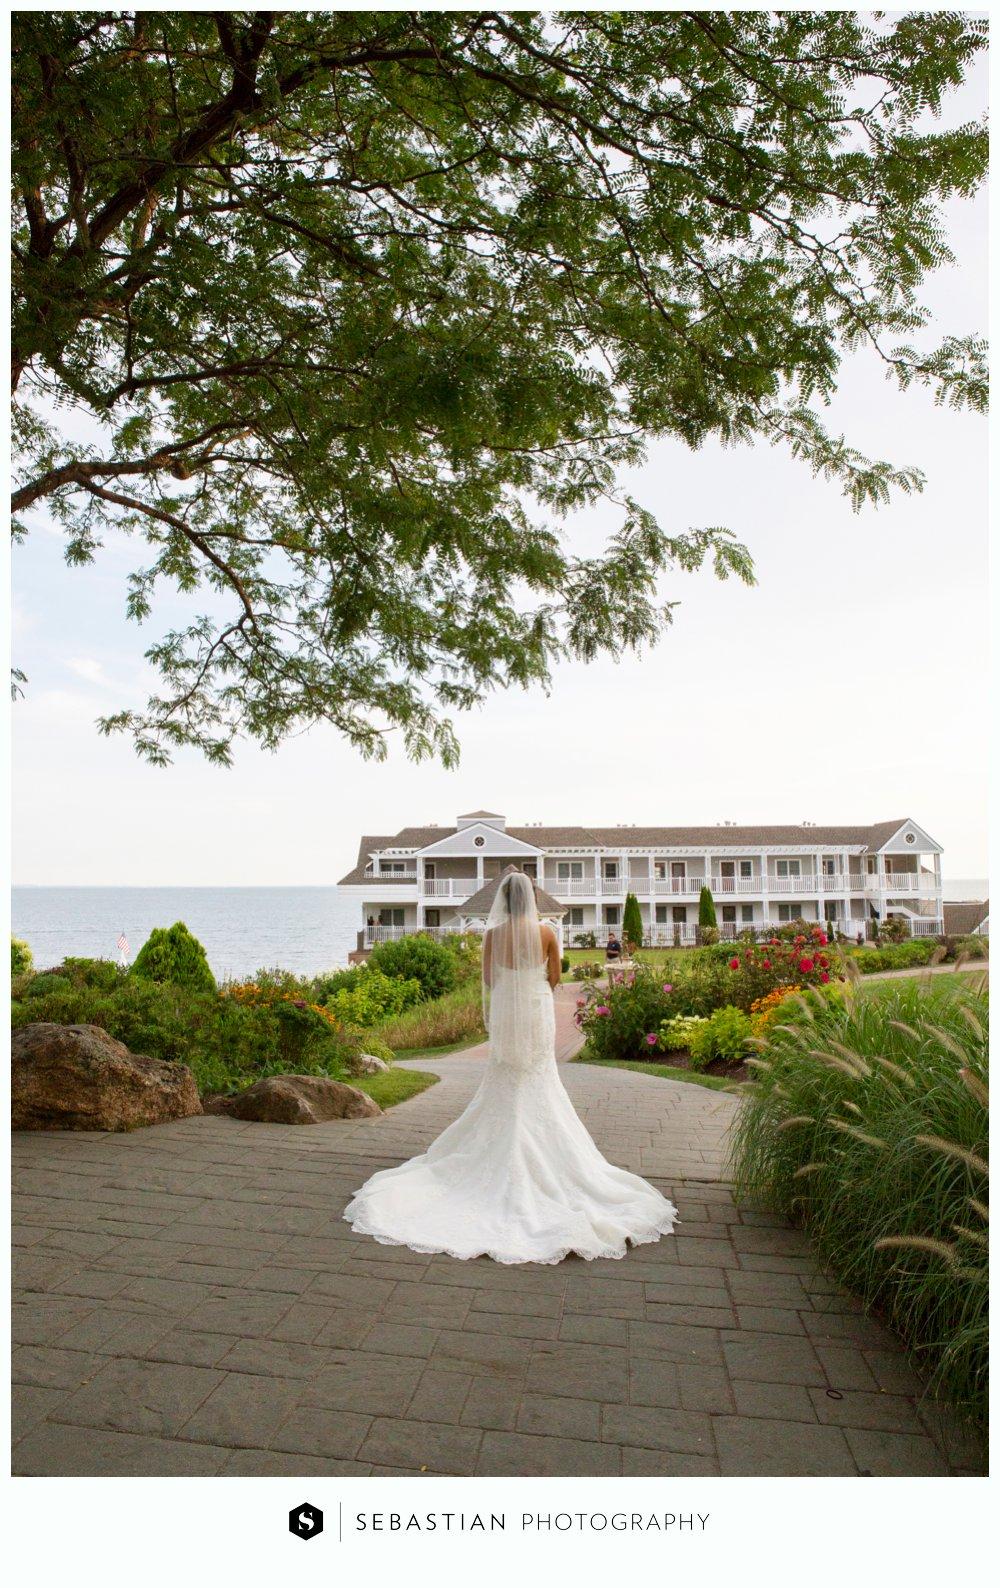 Sebastian Photography_CT Wedding Photographer_Water's Edge Wedding_1027.jpg